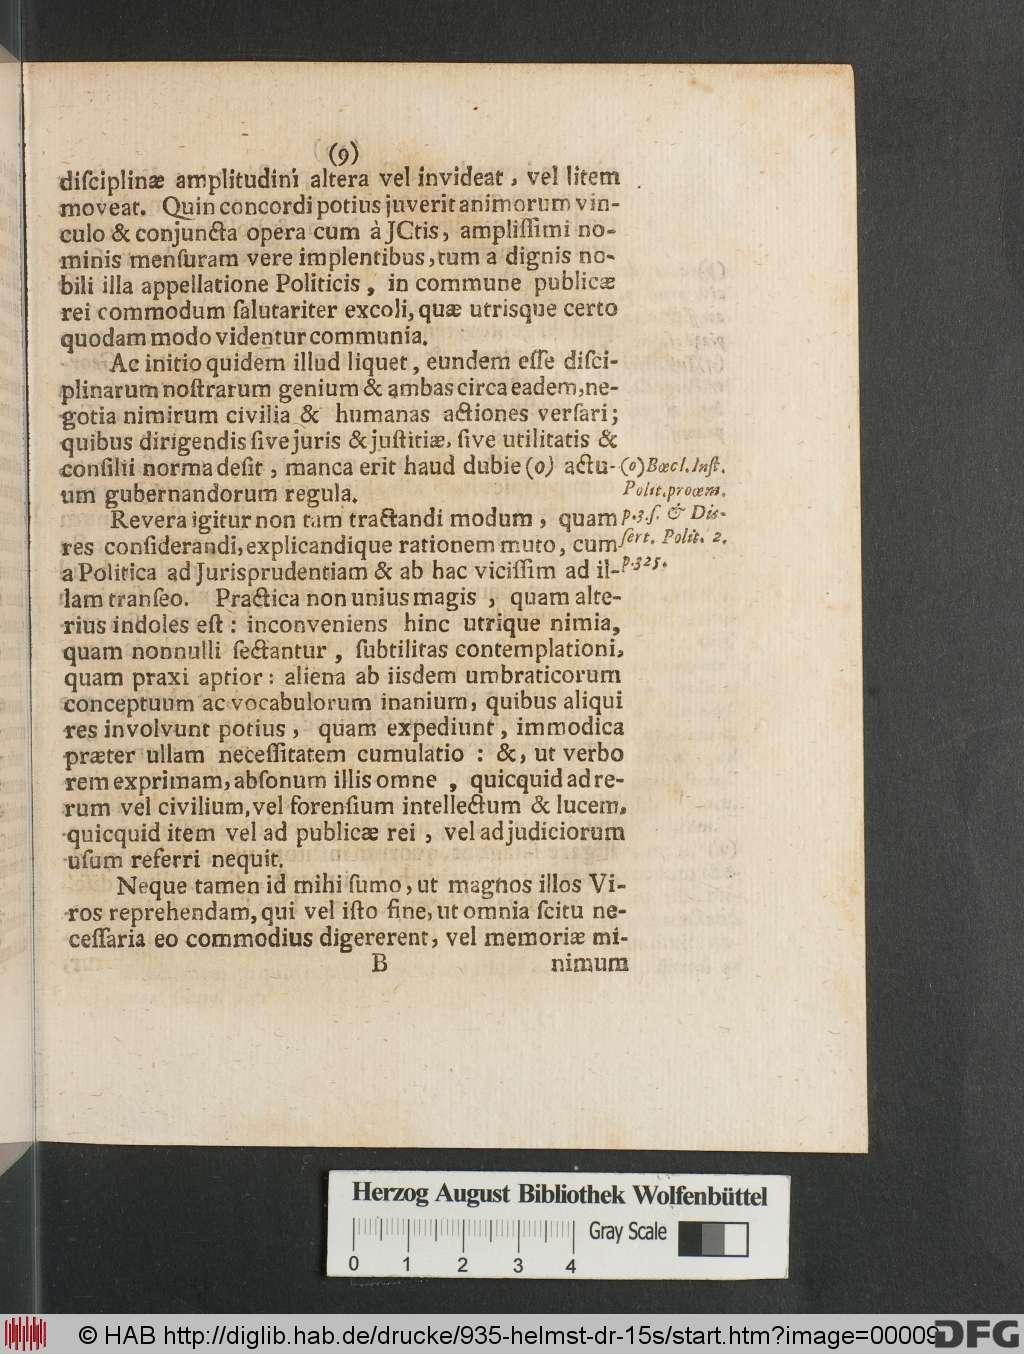 https://diglib.hab.de/drucke/935-helmst-dr-15s/00009.jpg